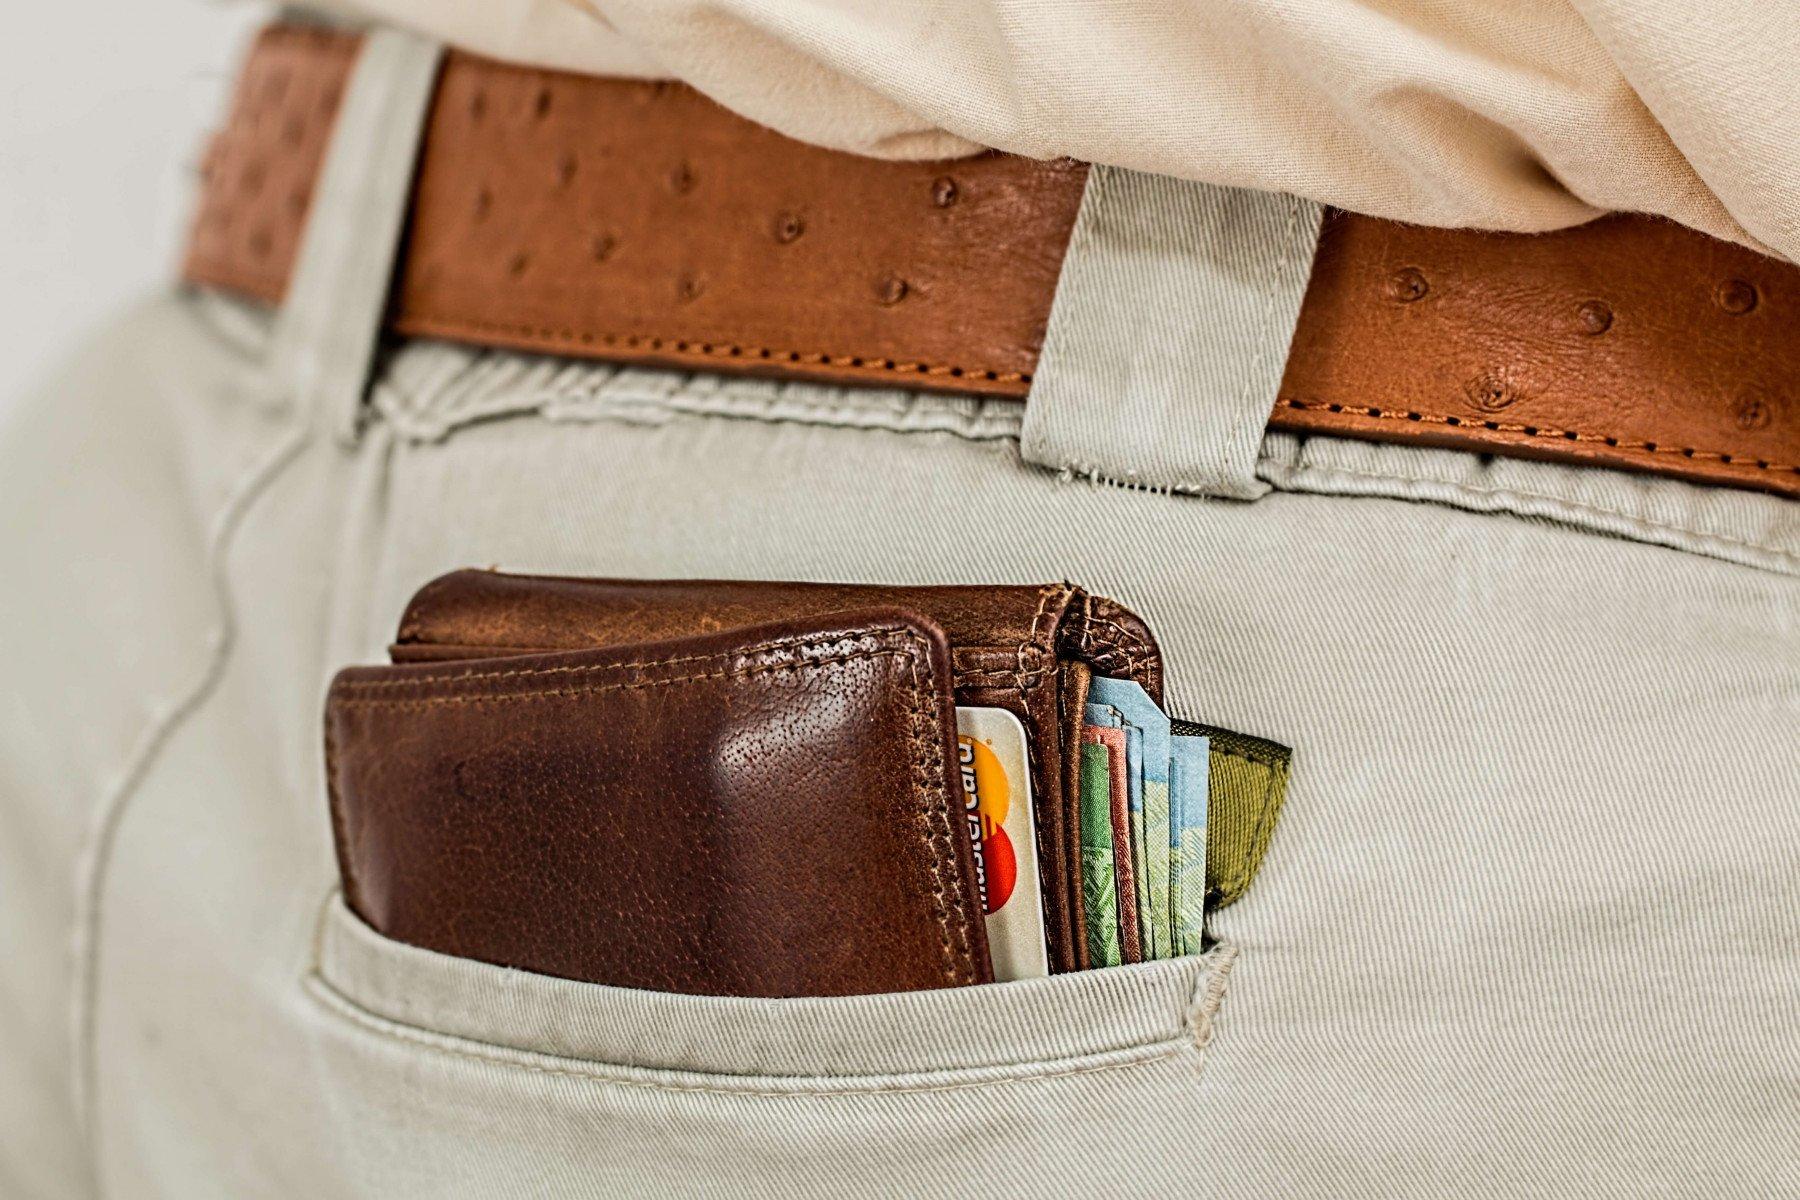 En brun skinnplånbok i bakfickan på ett par byxor